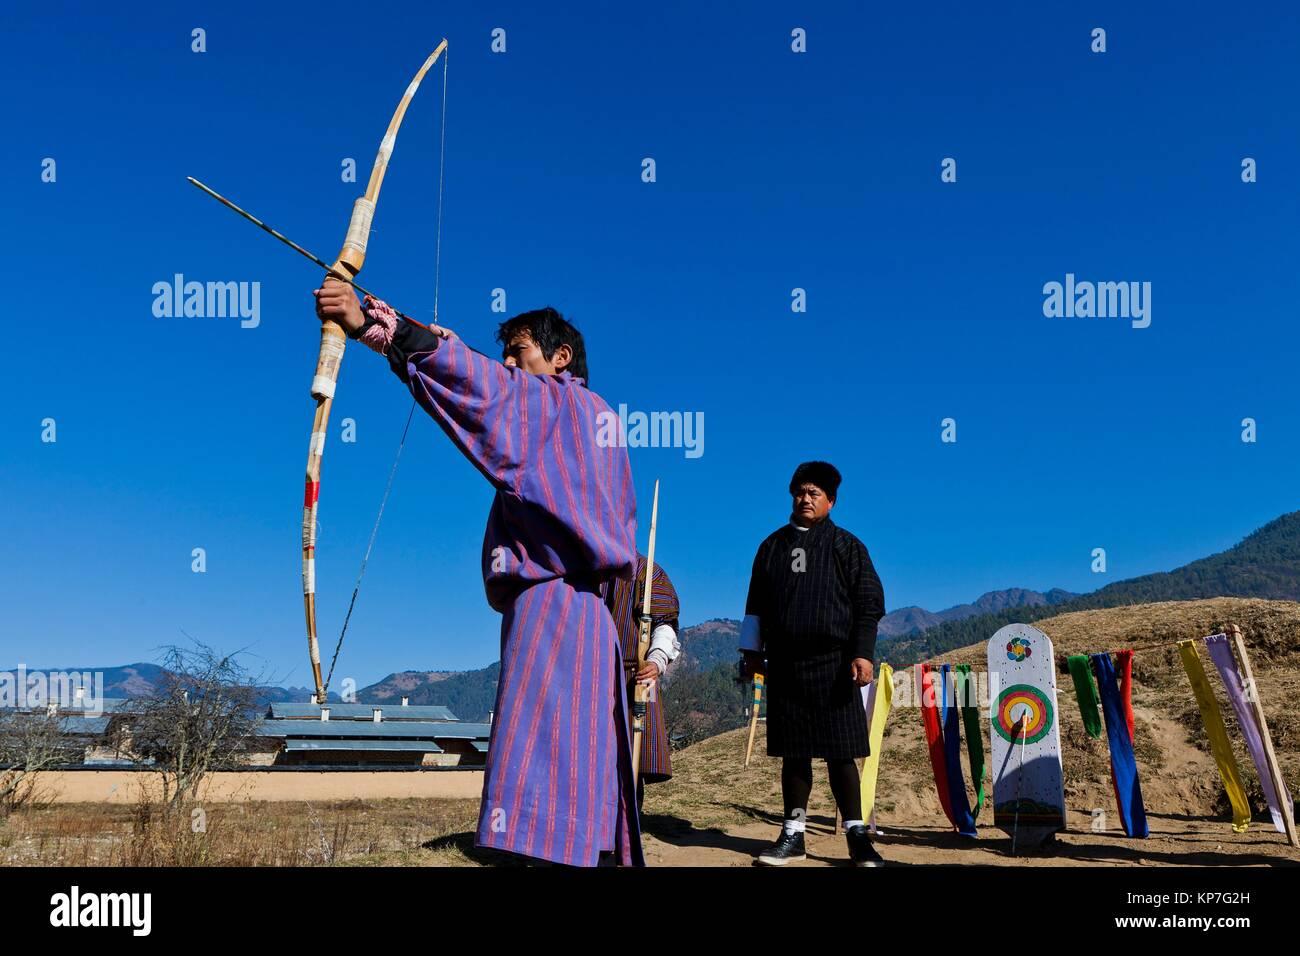 Archery, Bhutan´s national sport, Bumthang, Bhutan, Asia - Stock Image